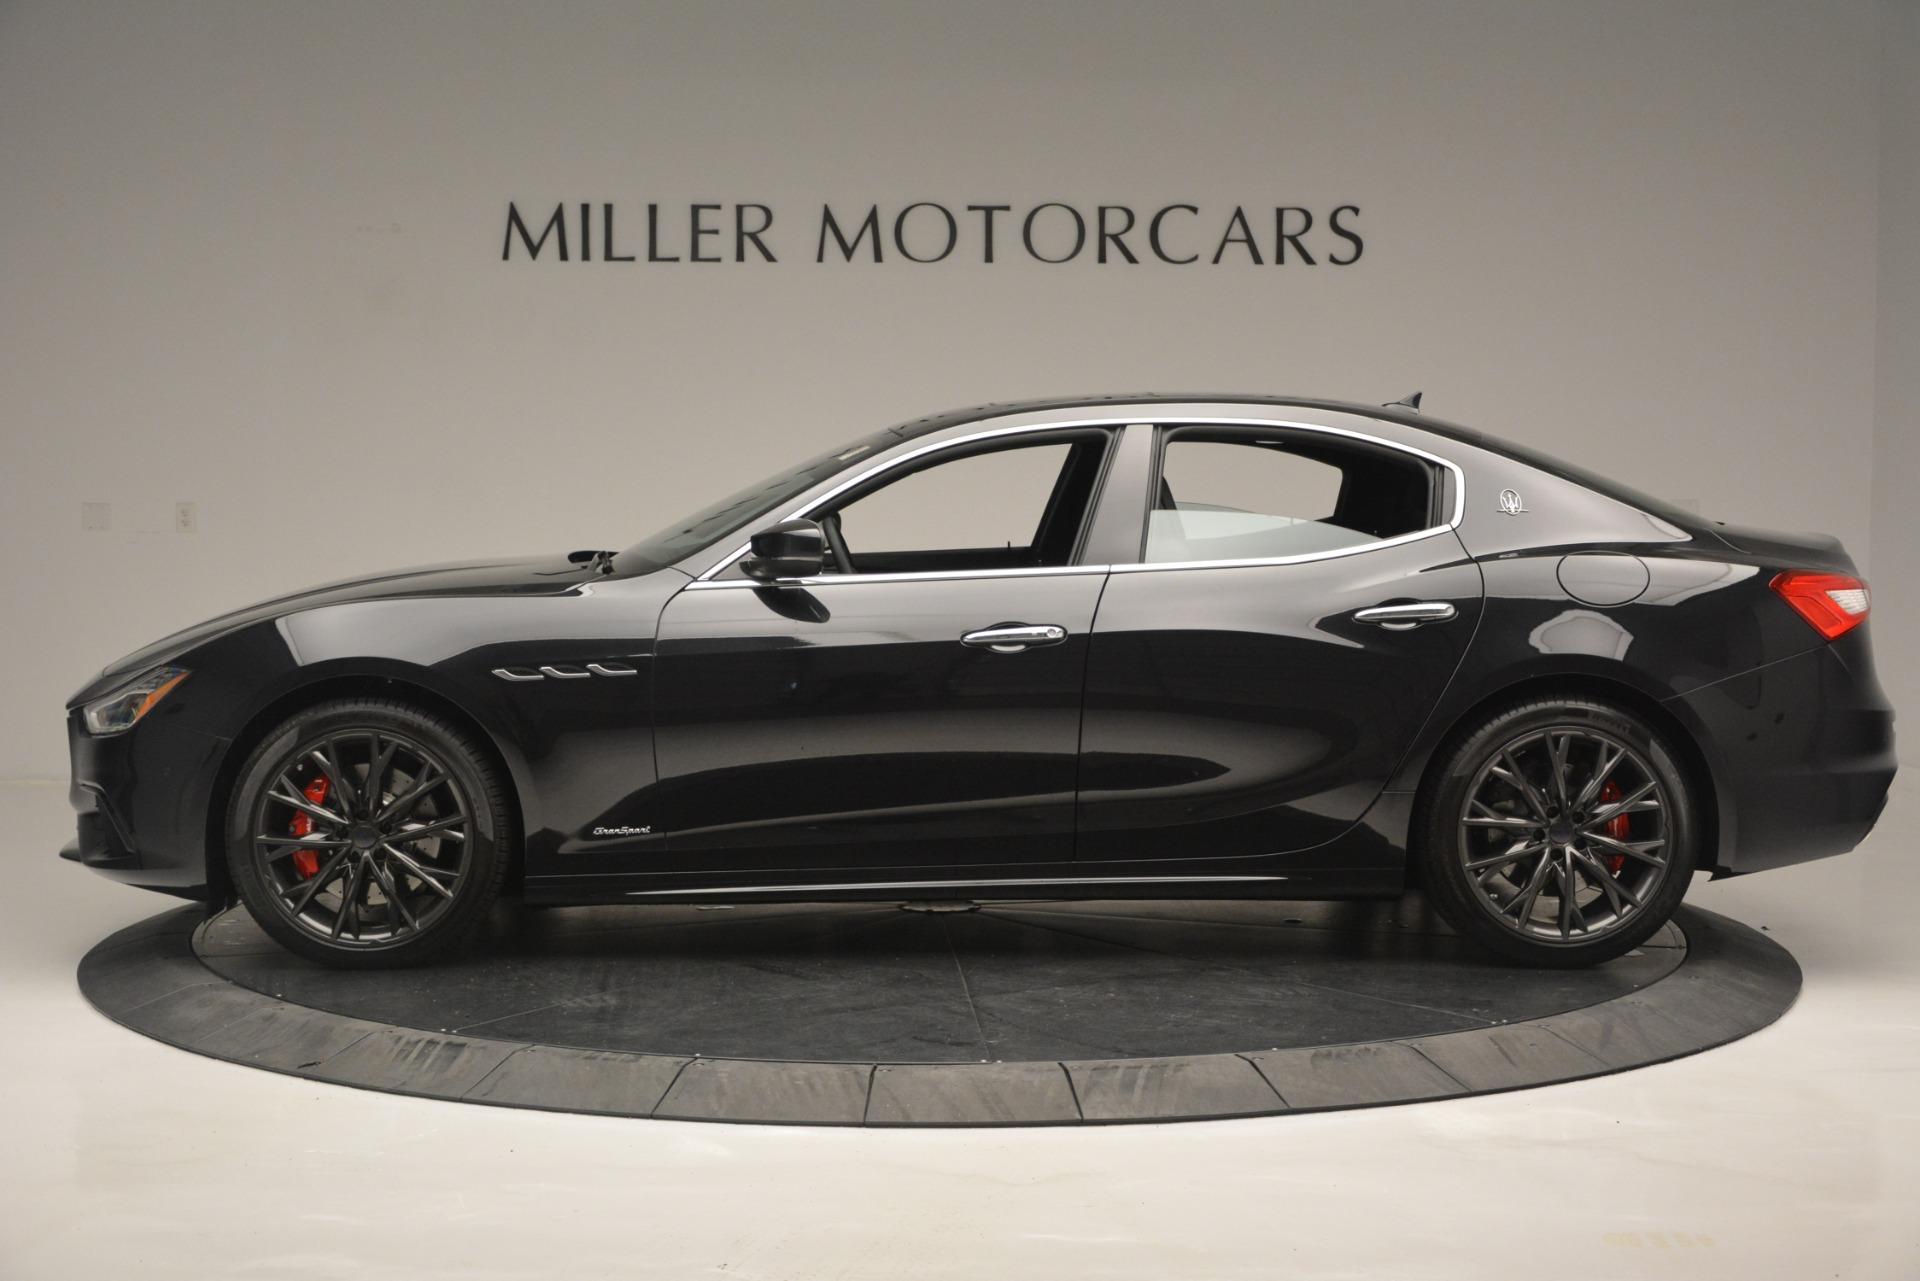 New 2019 Maserati Ghibli S Q4 GranSport For Sale In Greenwich, CT 2765_p3